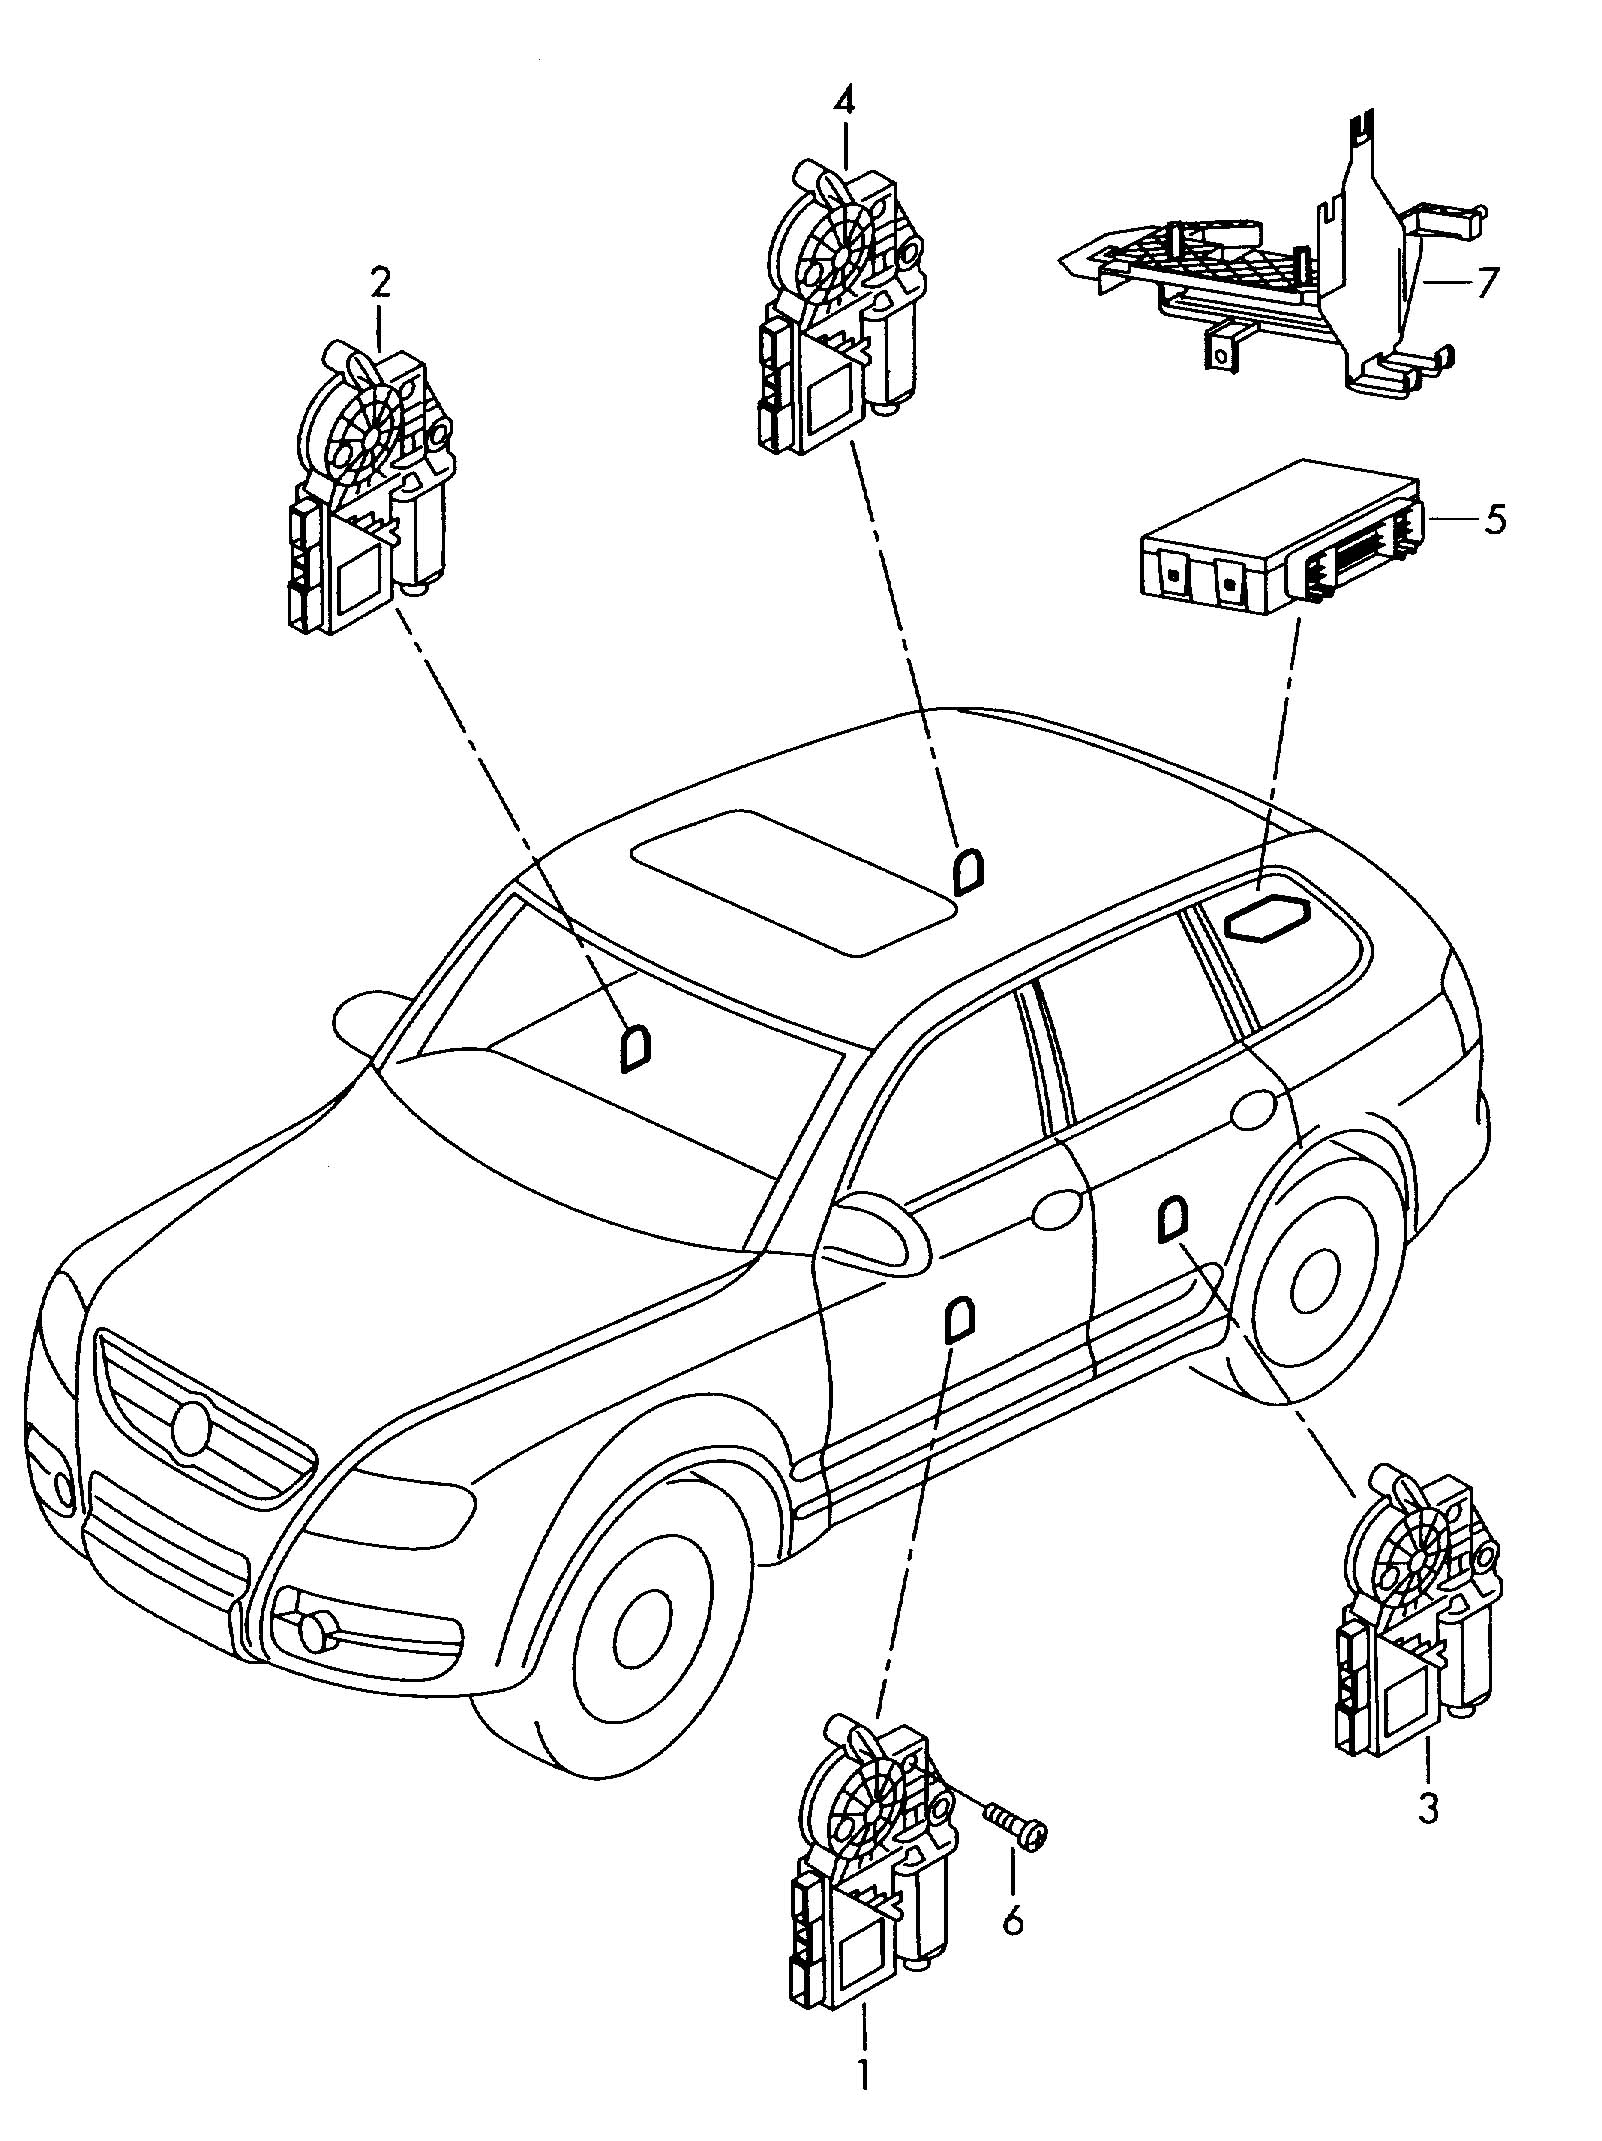 Volkswagen Touareg Central Electronic Control Unit